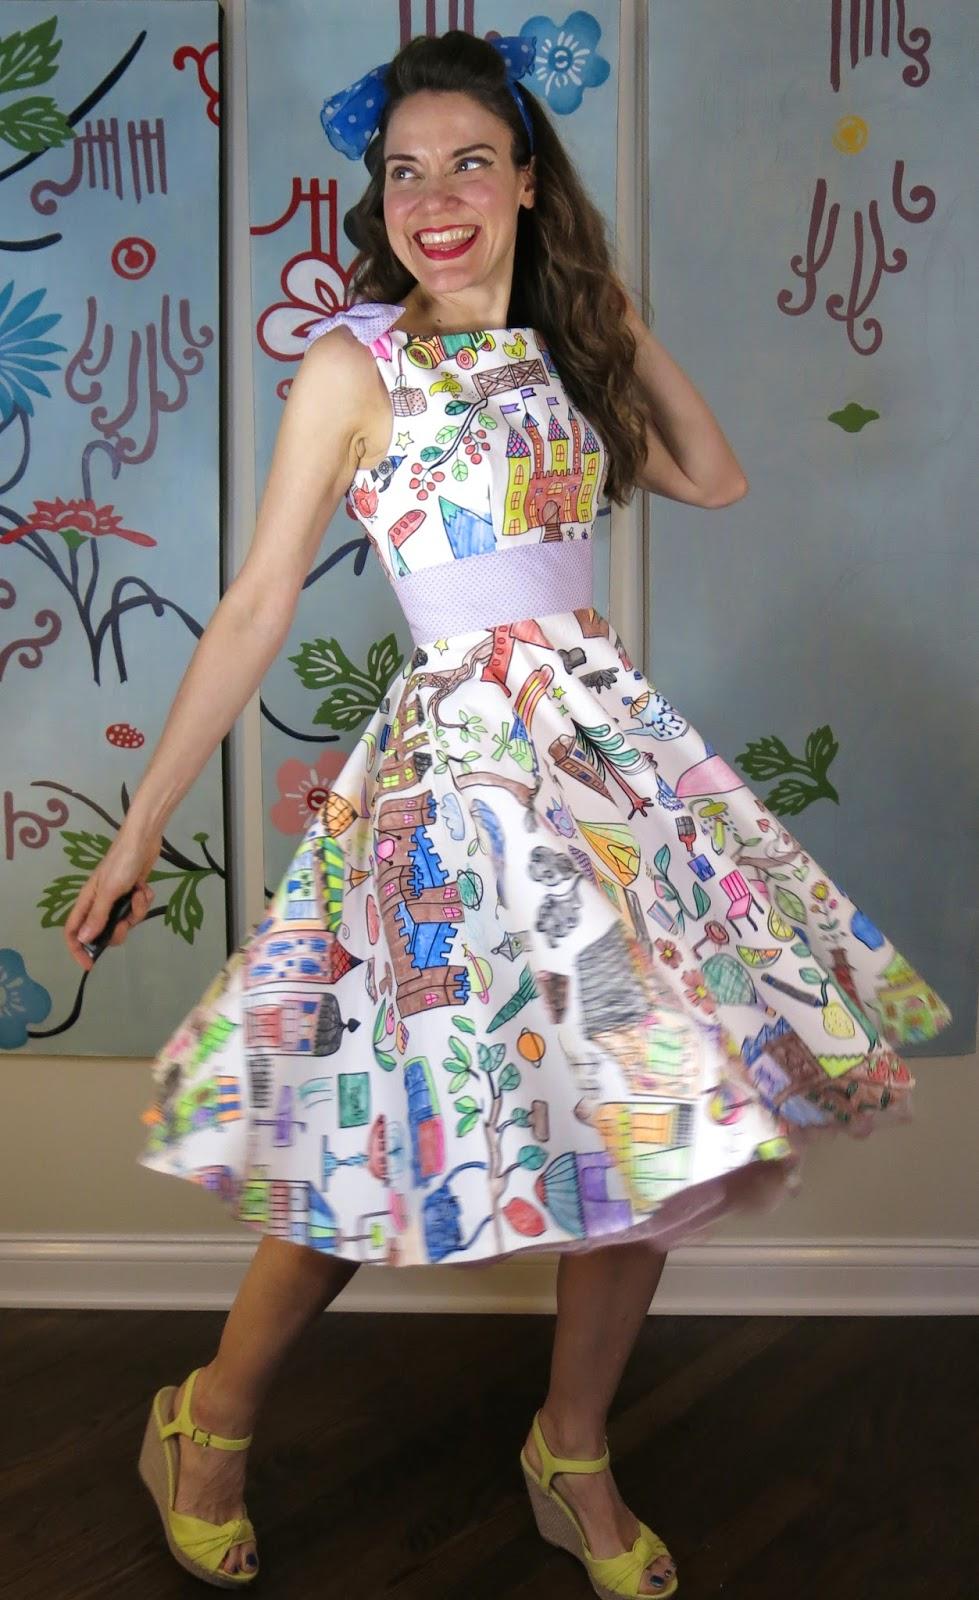 cassie stephens diy a coloring book dress